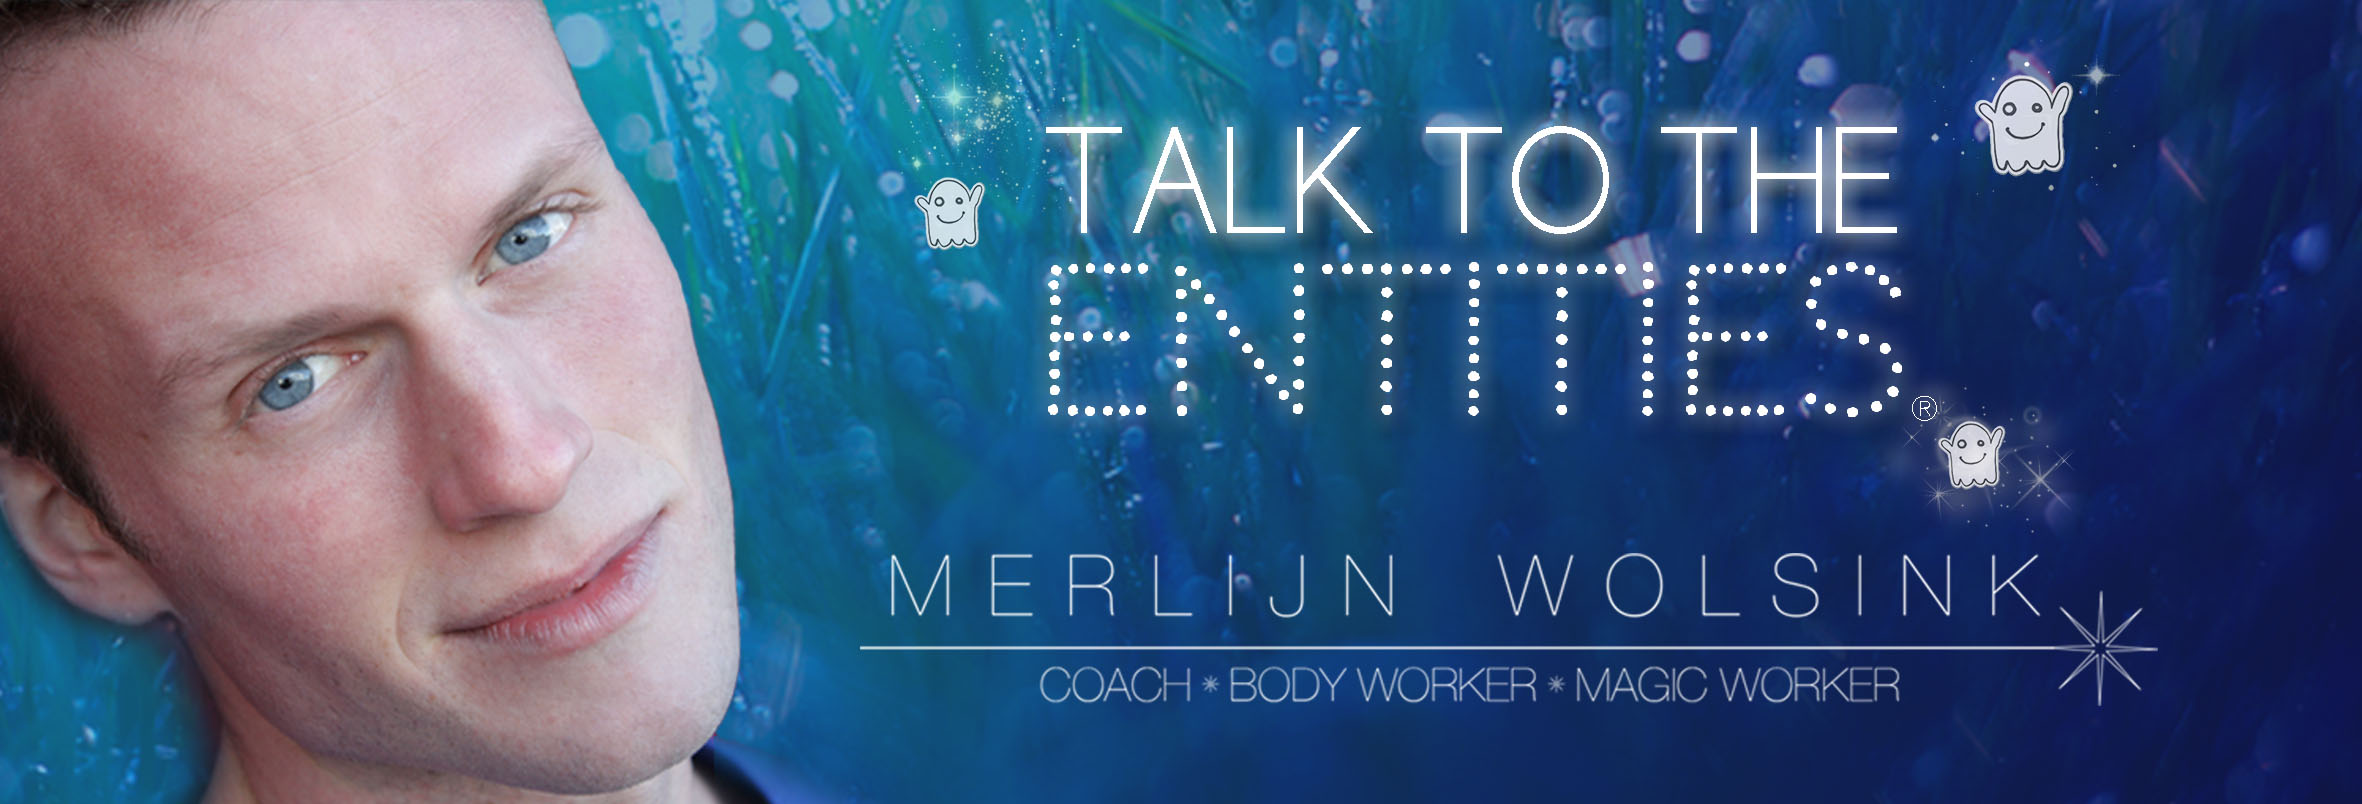 Talk To The Entities Merlijn Wolsink